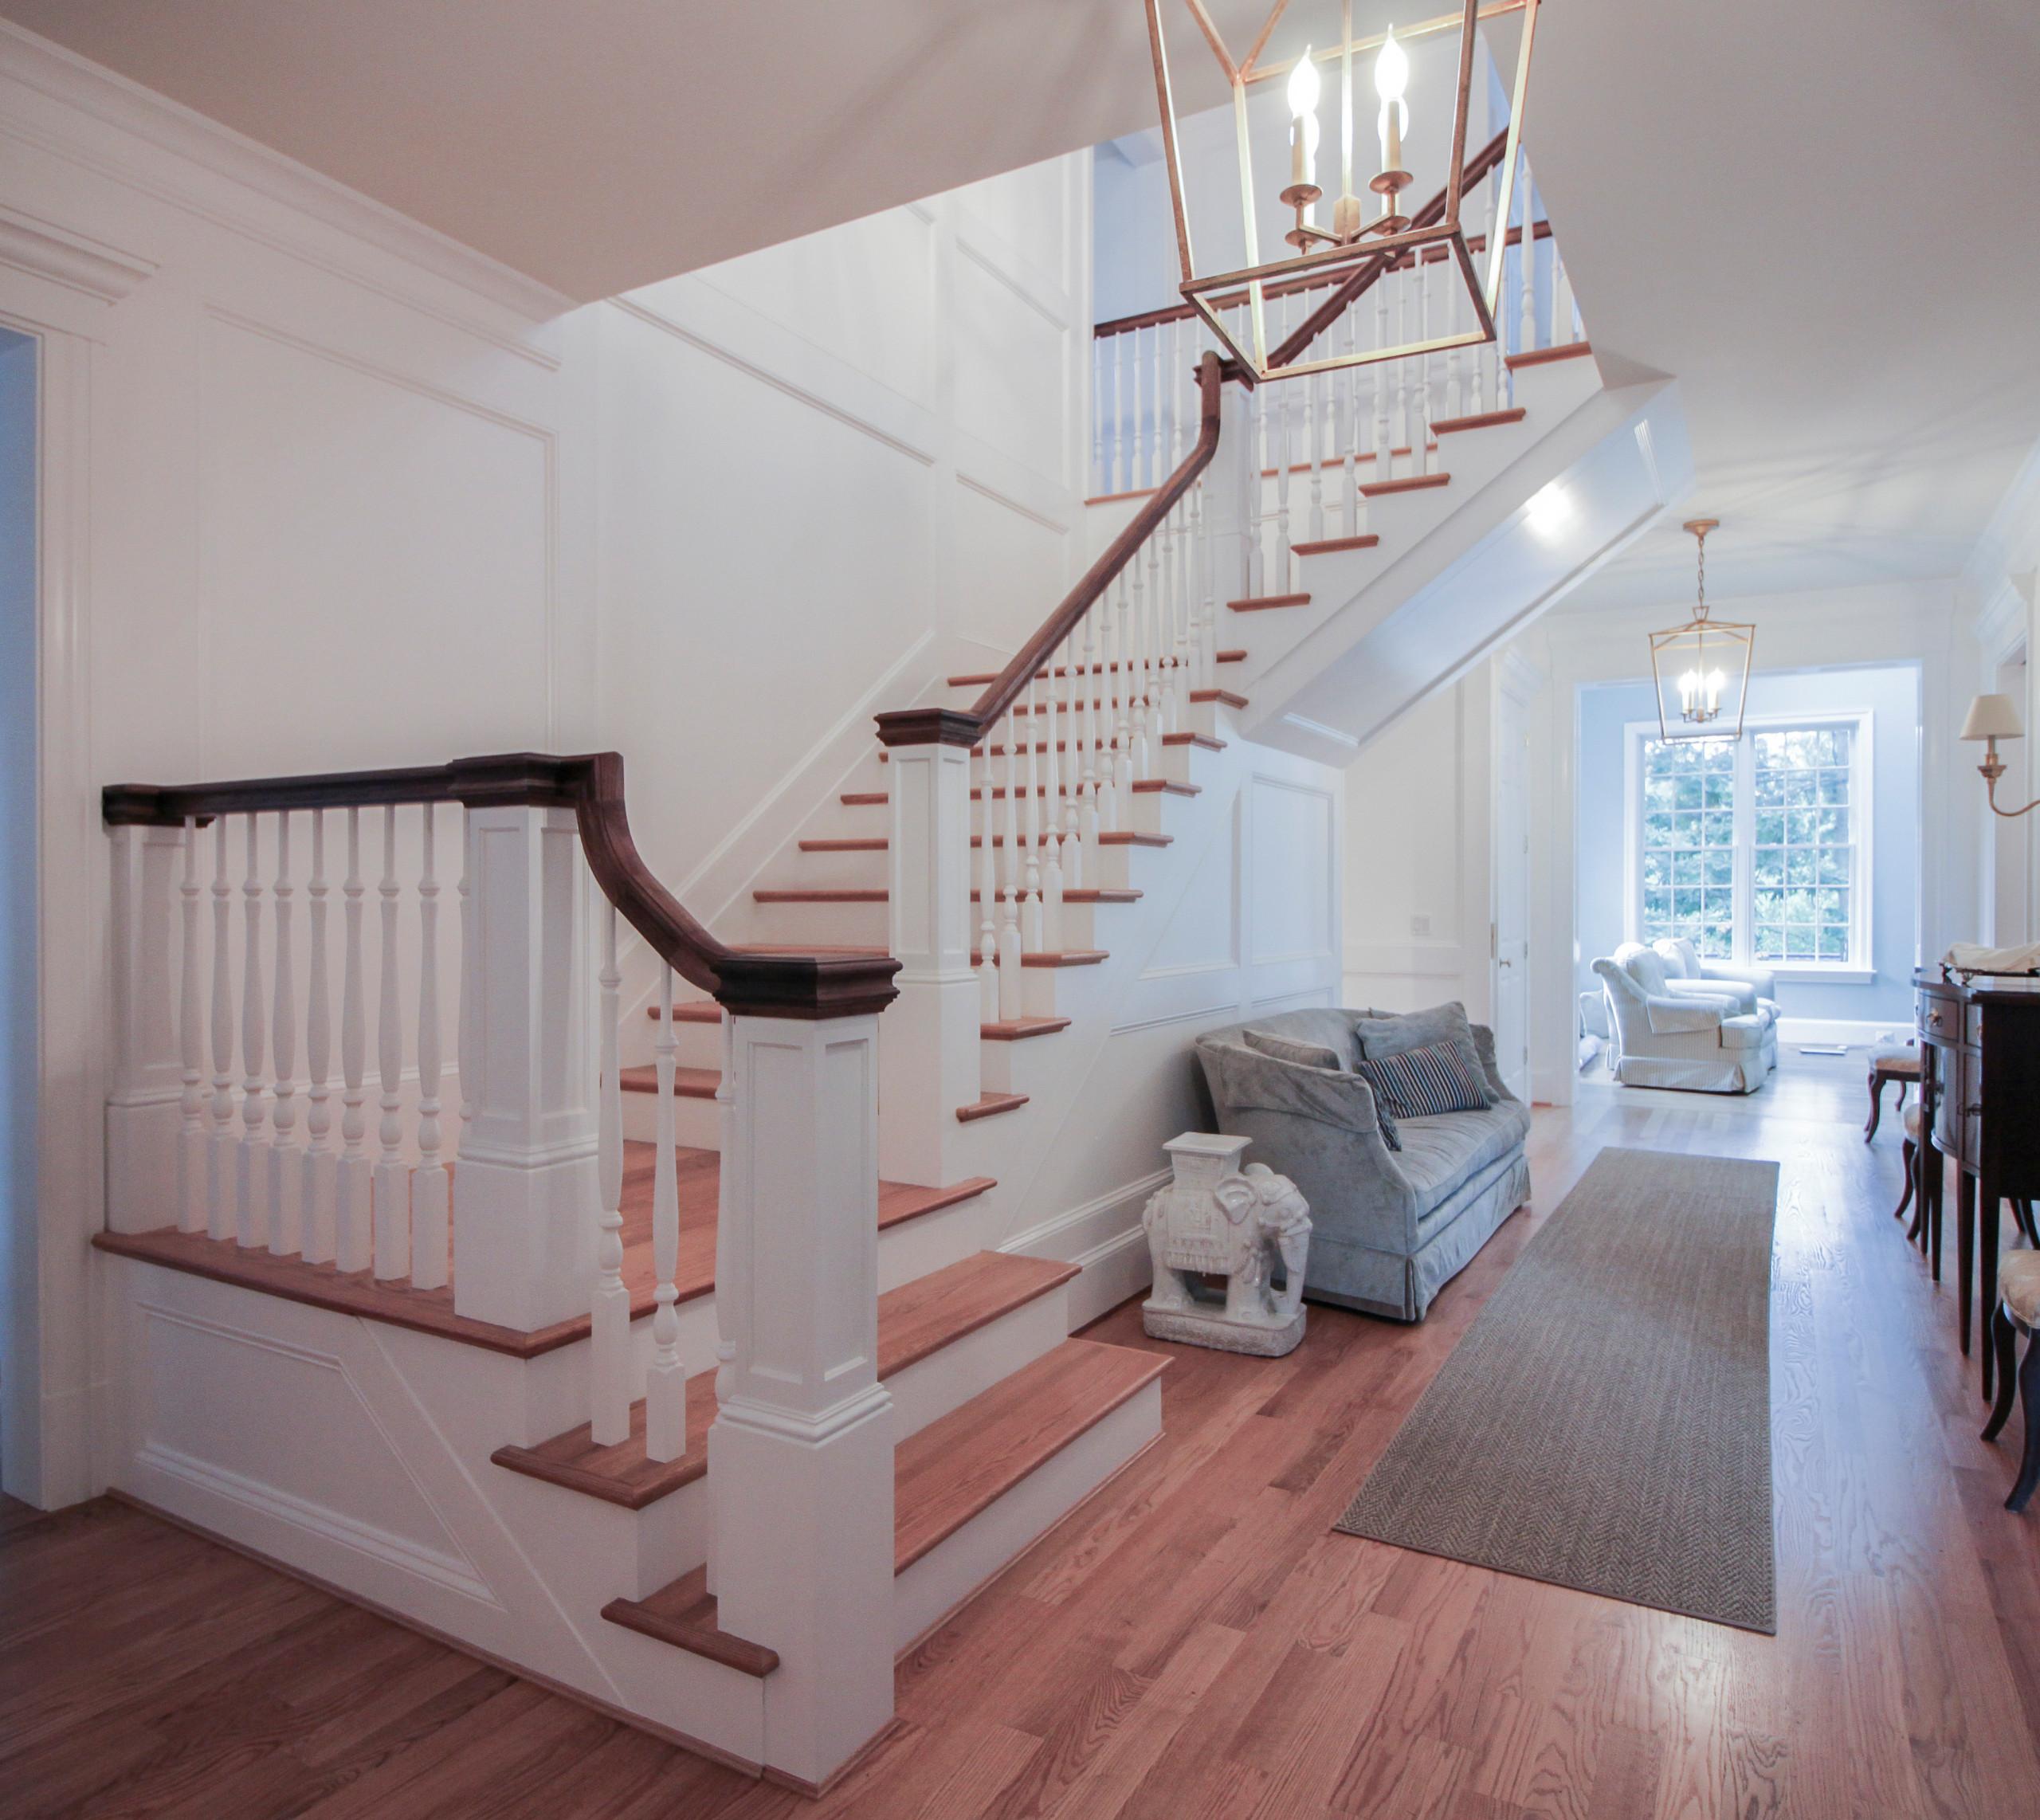 56_Elegant Wall-Mounted Craftsman Style Staircase, Arlington VA 22205